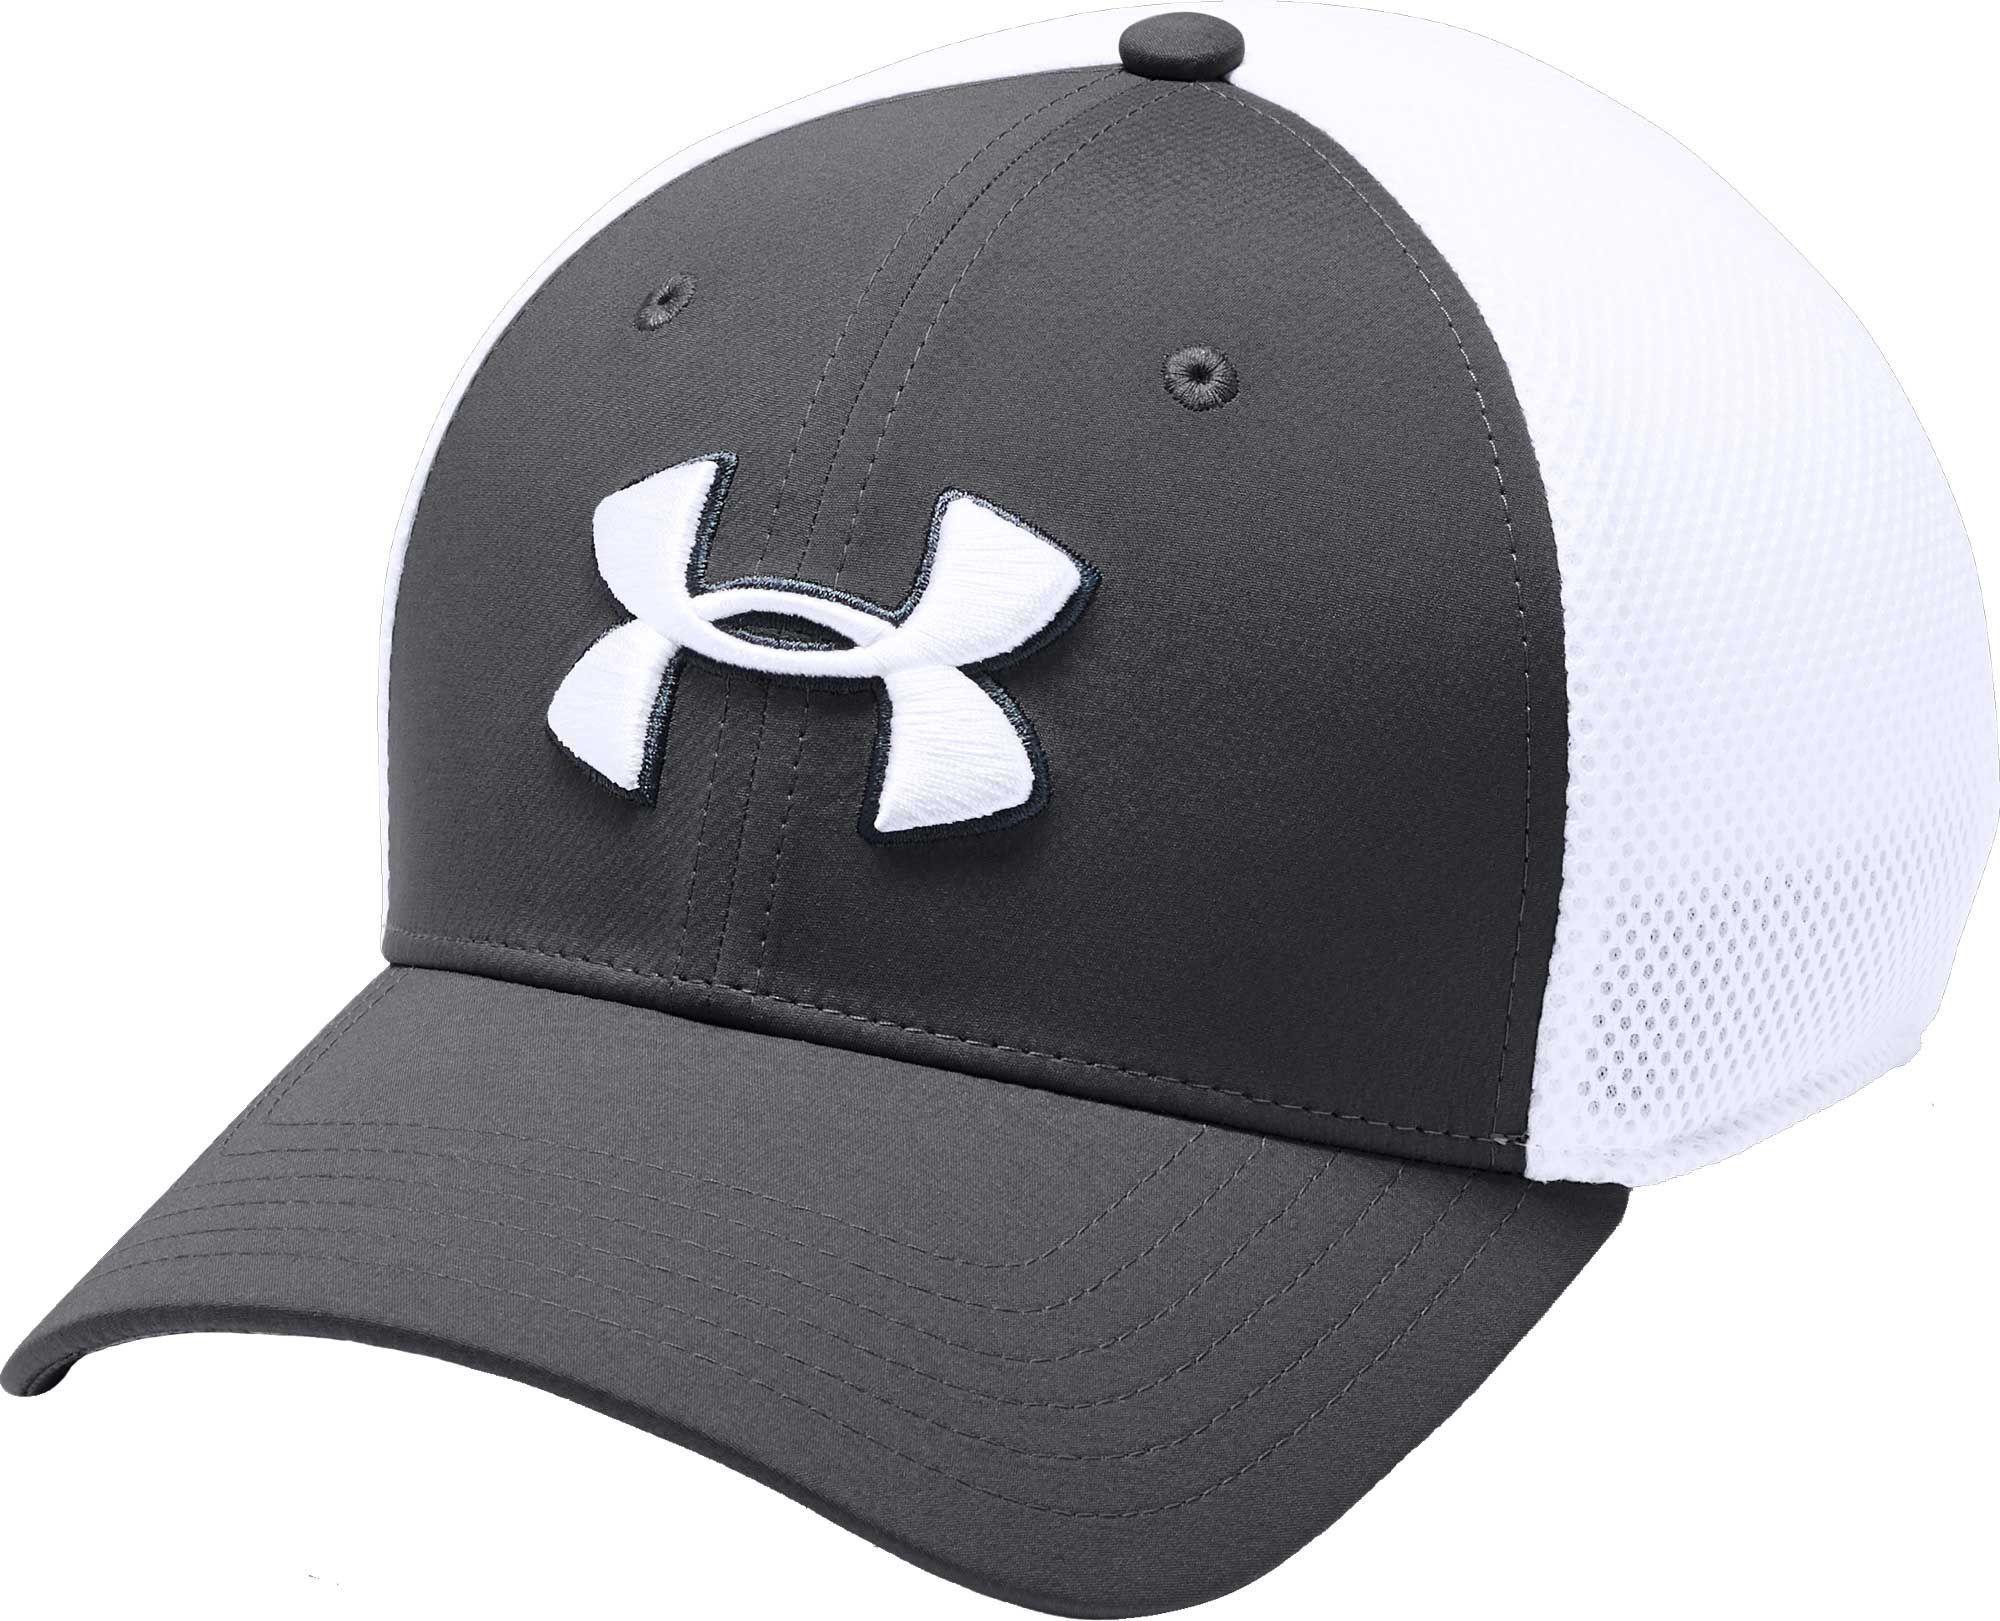 f270f63b5d1 Under Armour Men s Threadborne Mesh Golf Hat